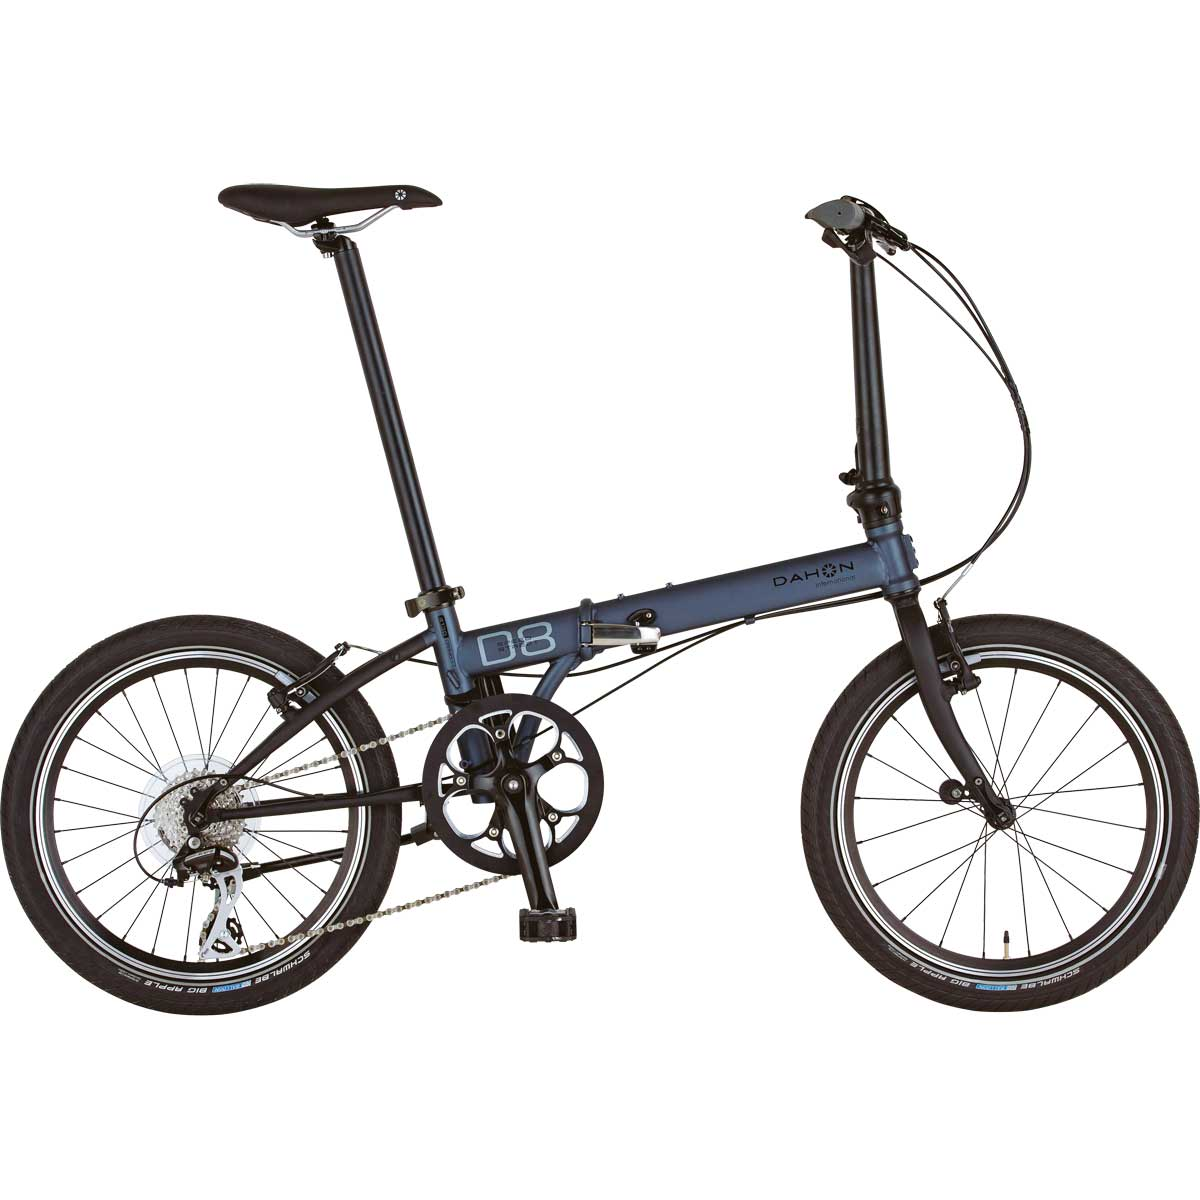 DAHON/ダホン Speed D8 Street スピード D8 ストリートガンメタル(9011) 折りたたみ自転車 自転車本体